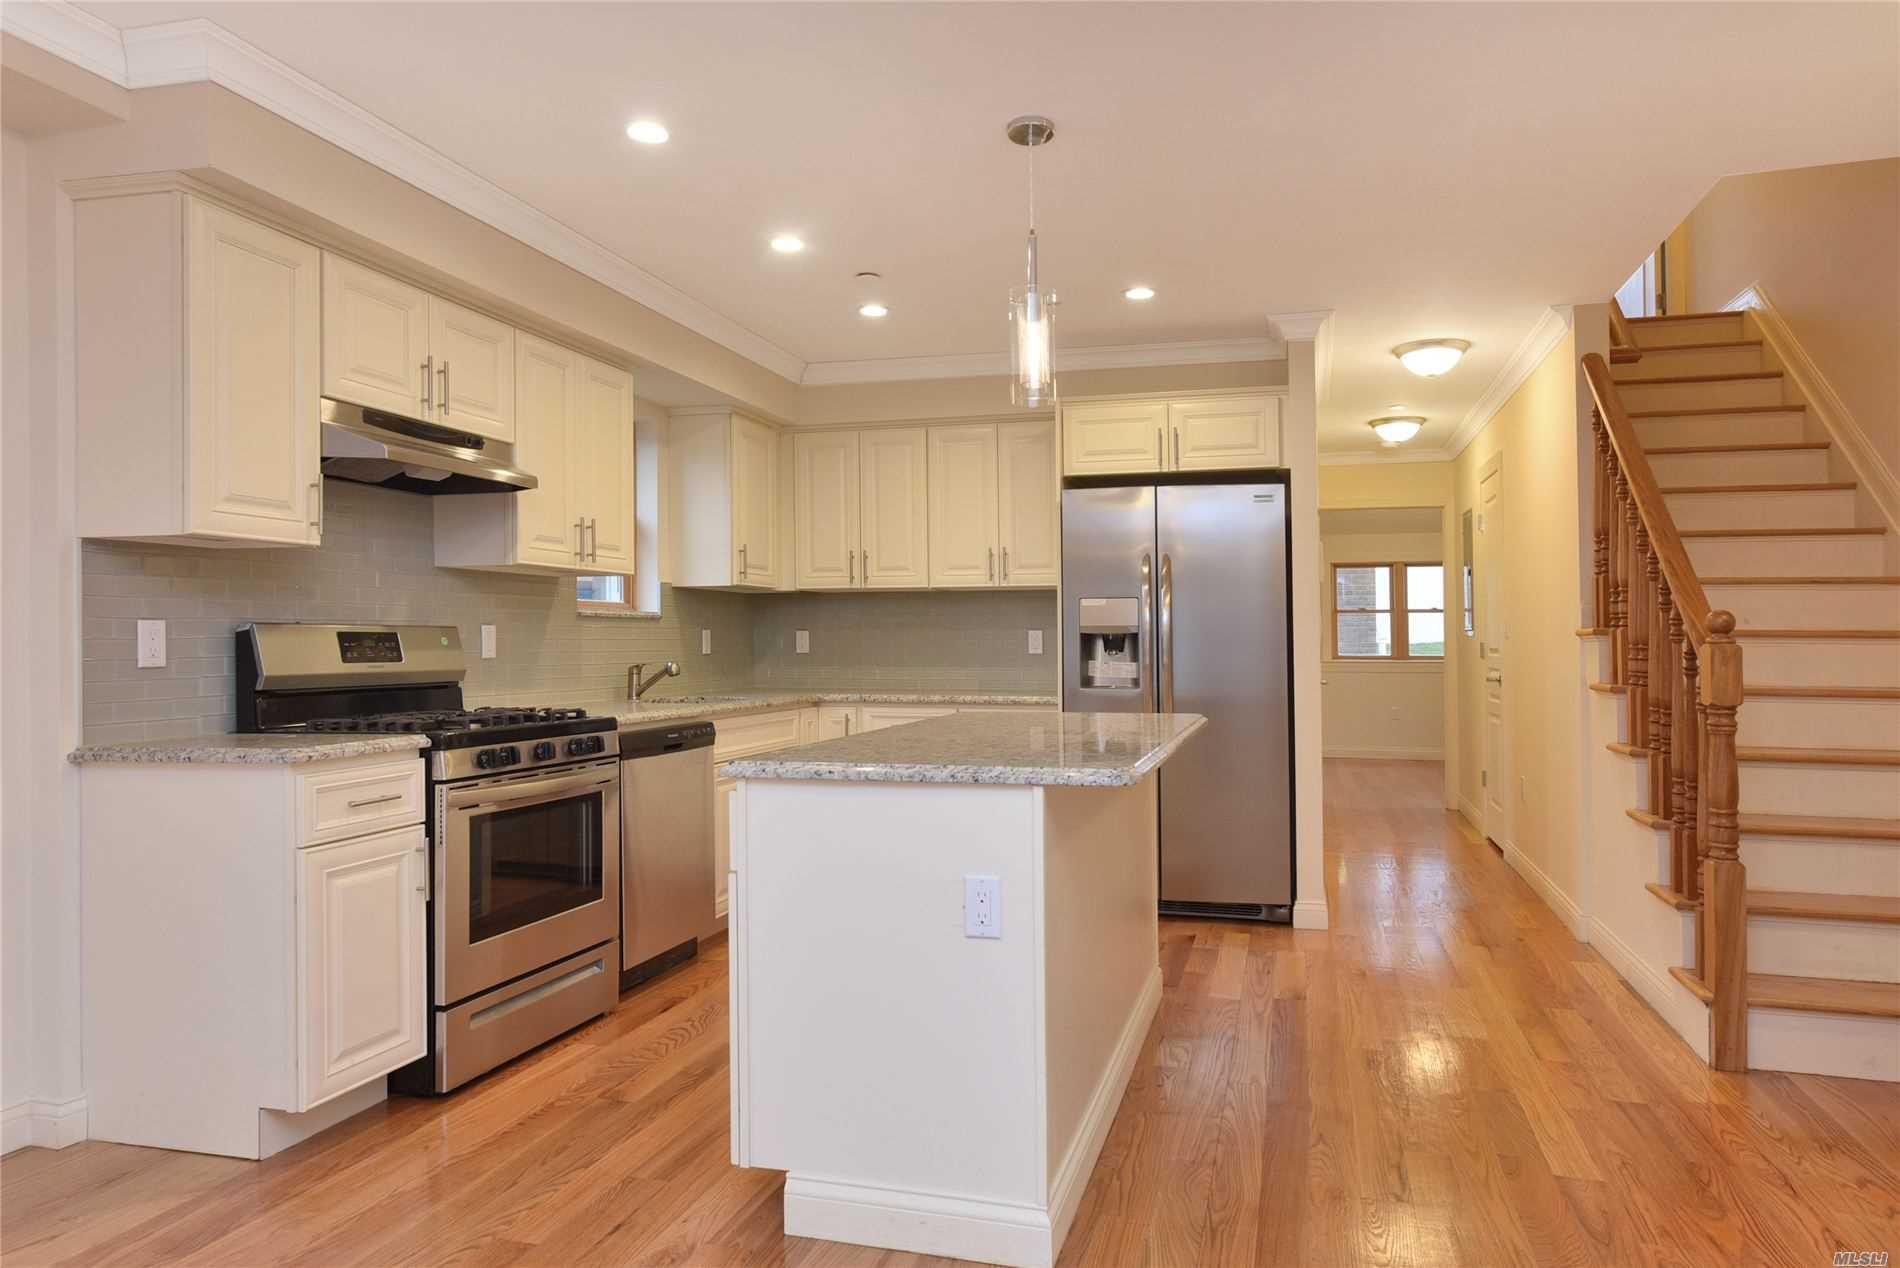 Property for sale at 64-10 Perry Avenue, Maspeth NY 11378, Maspeth,  New York 11378